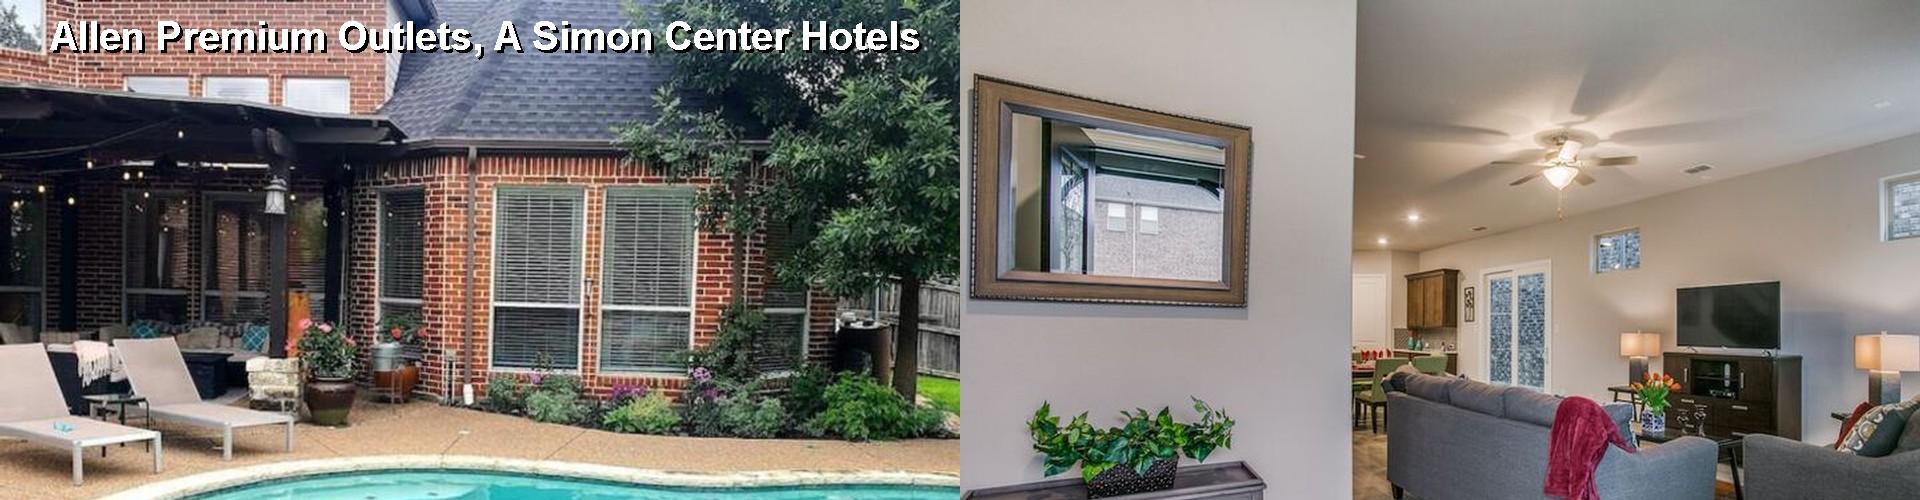 5 Best Hotels Near Allen Premium Outlets A Simon Center